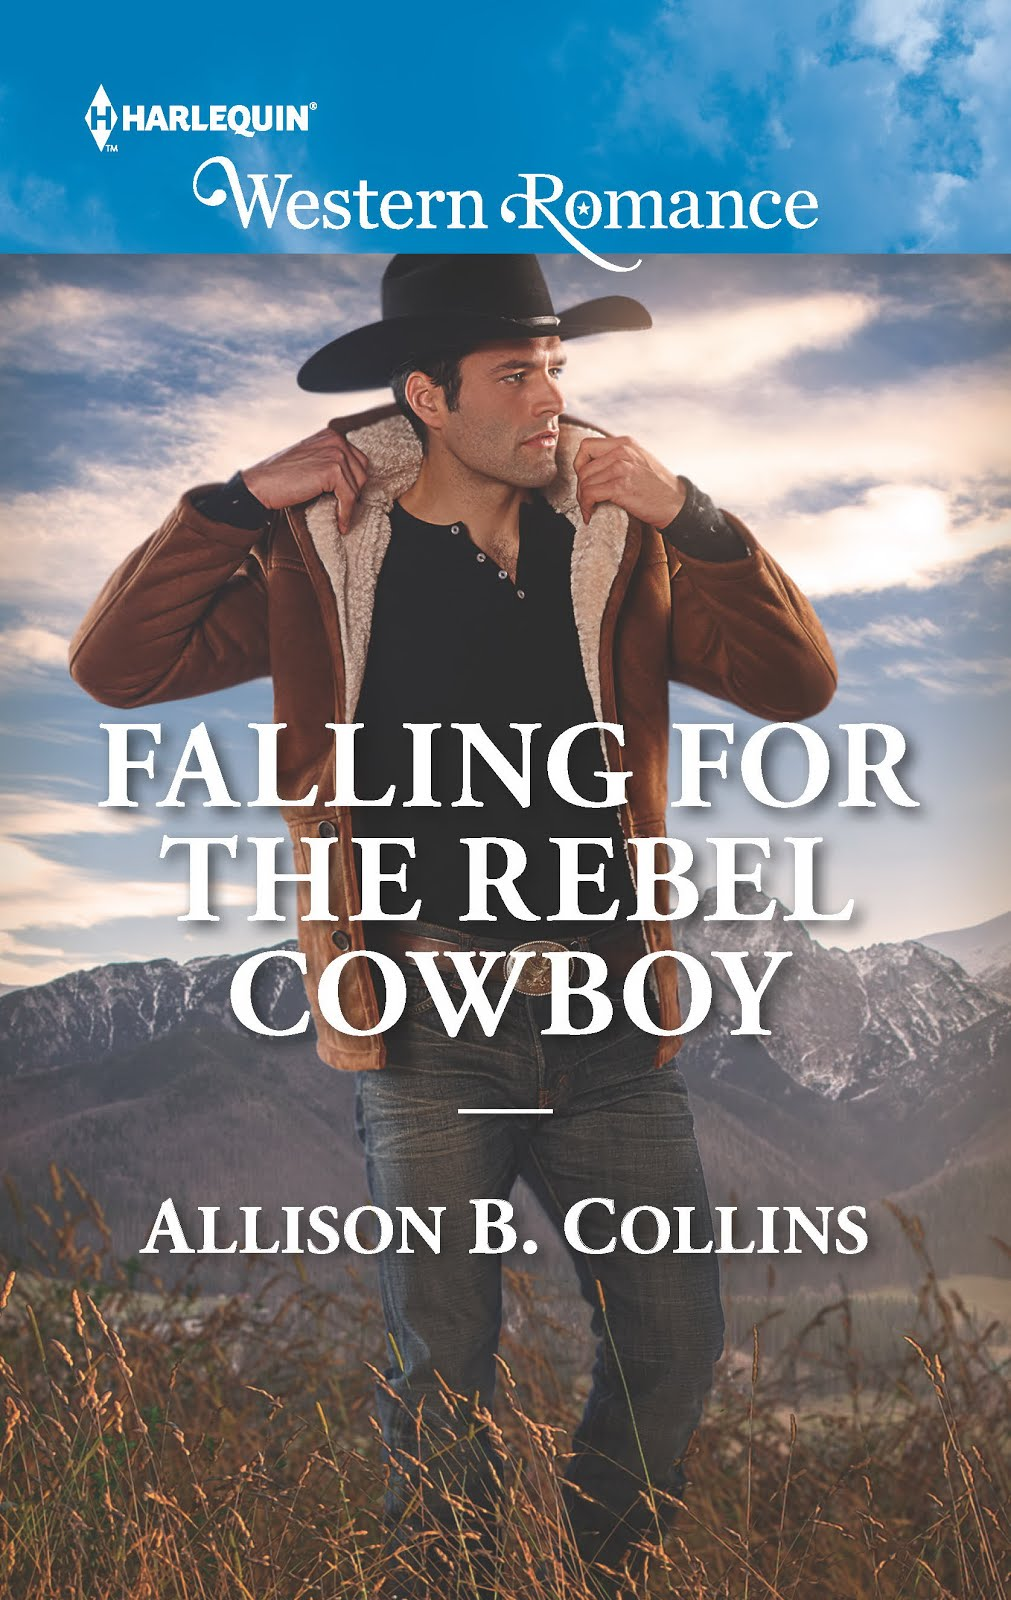 Allison B. Collins